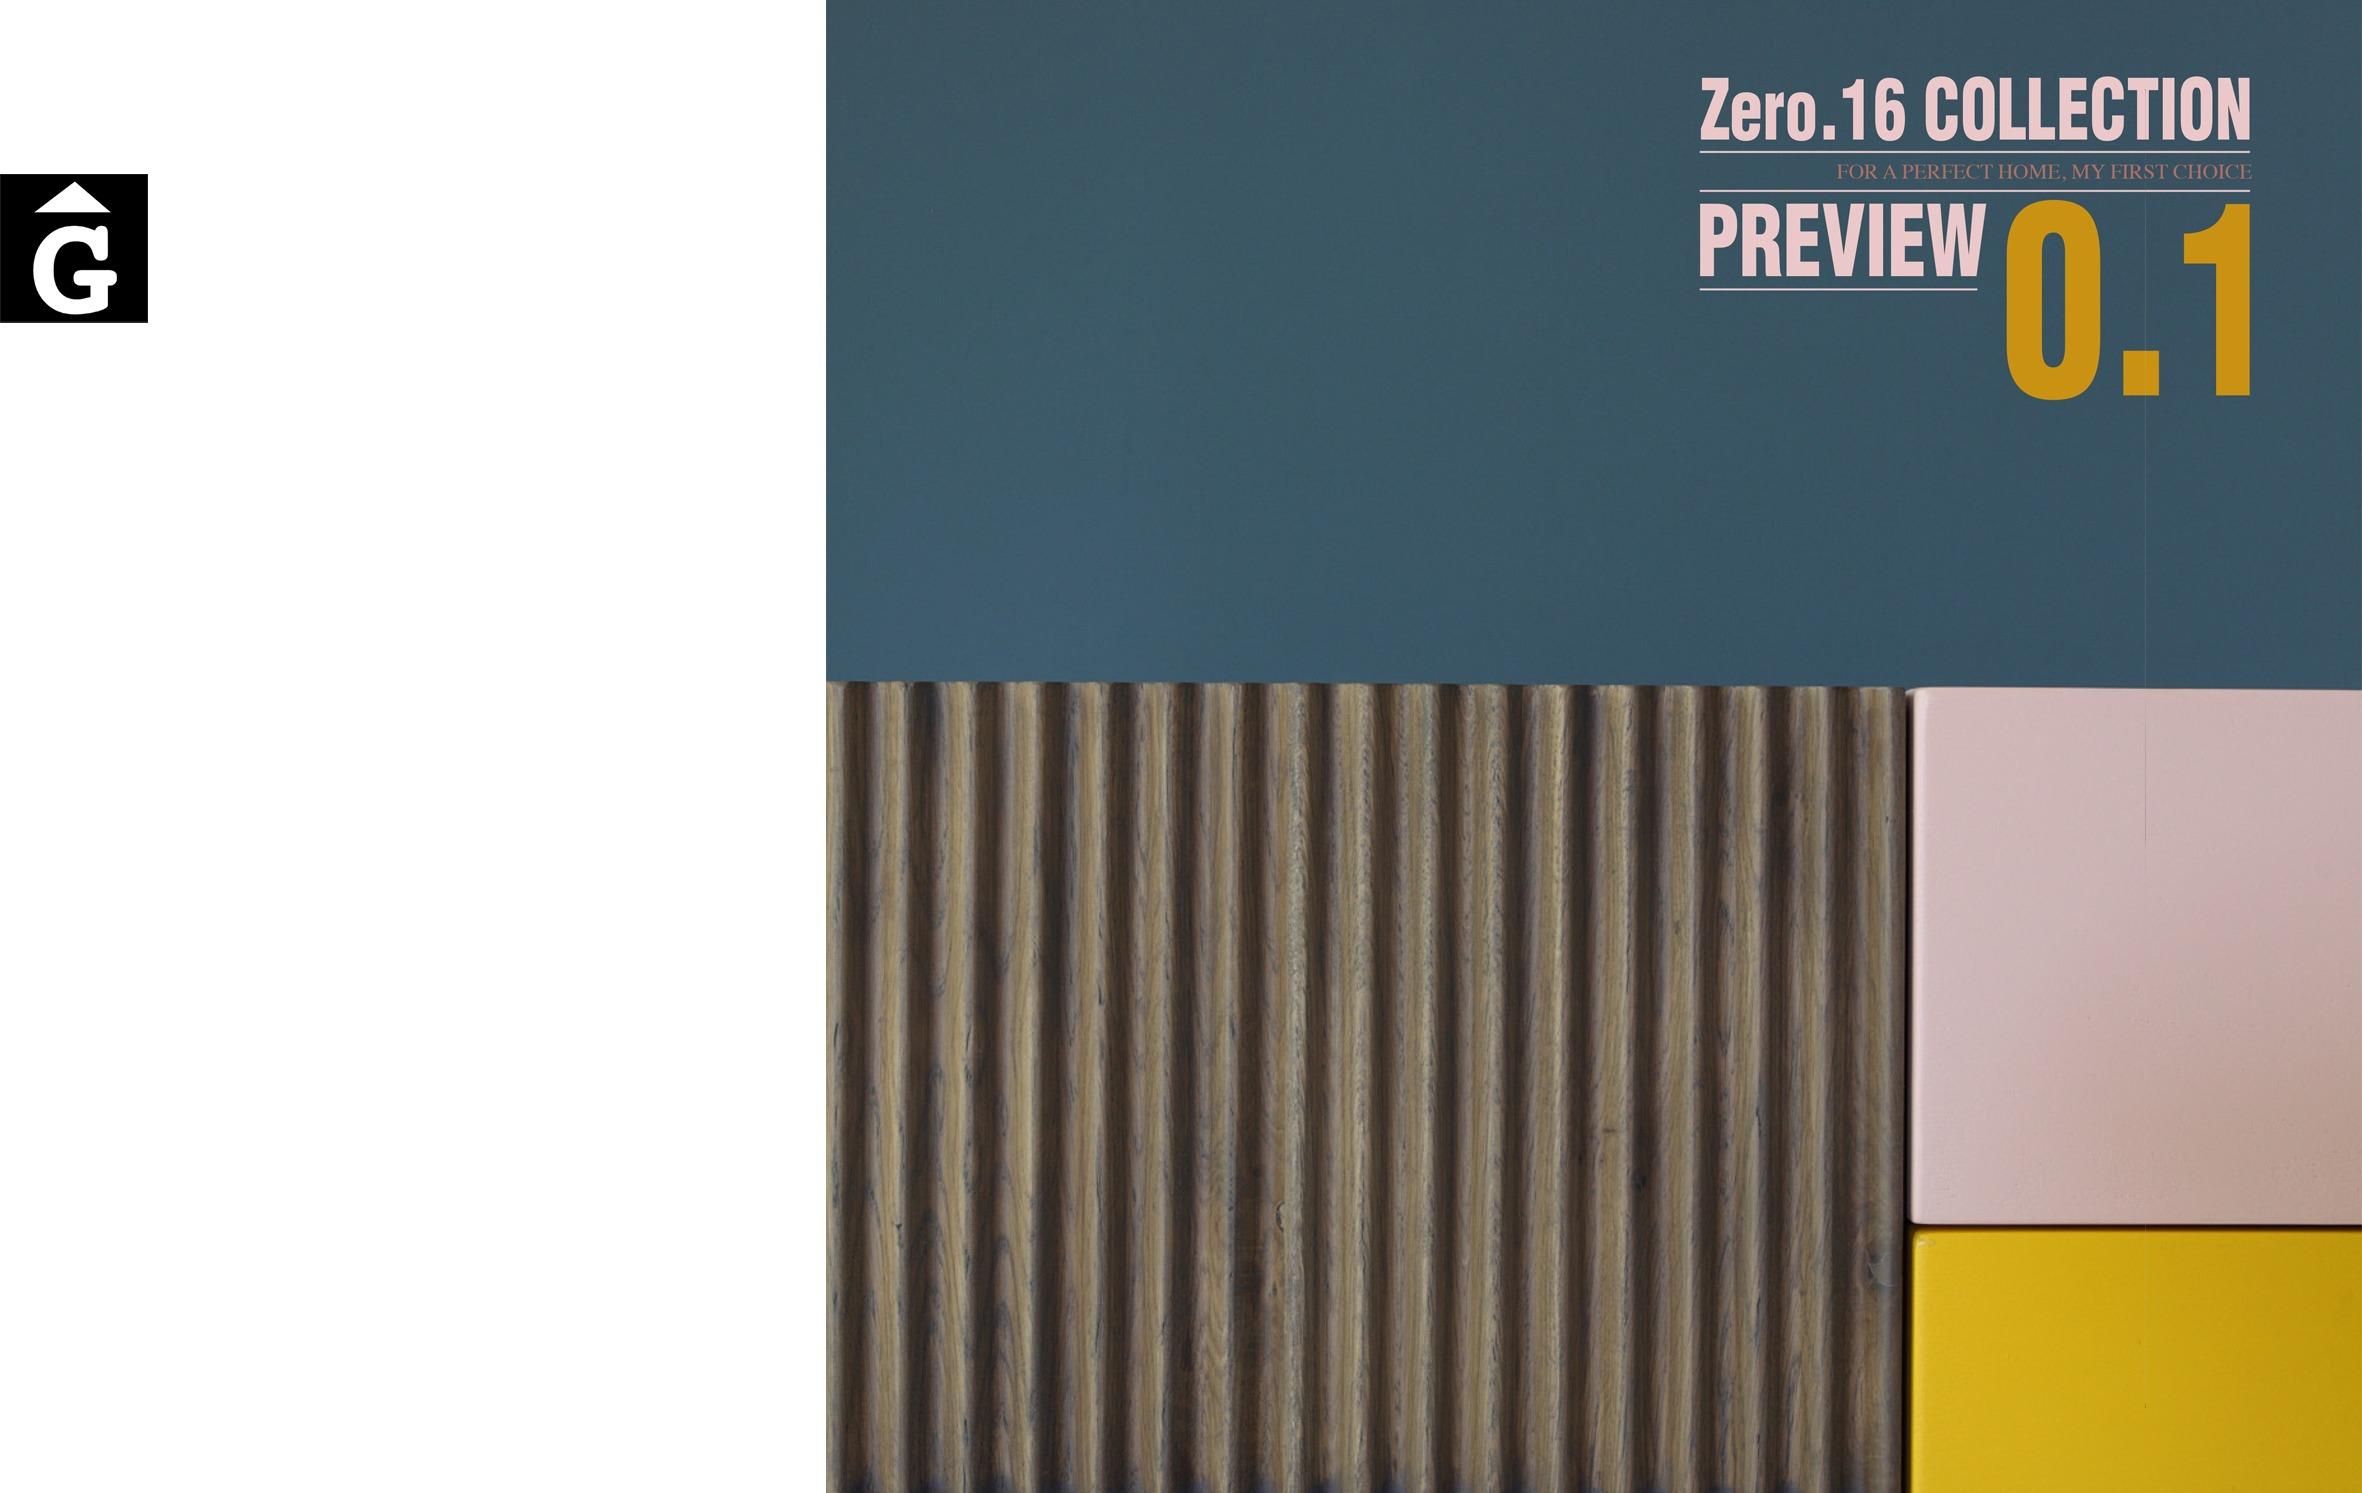 Devina Nais Zero.16 Previw by Mobles GIFREU Girona modern qualitat vanguardia minim elegant atemporal